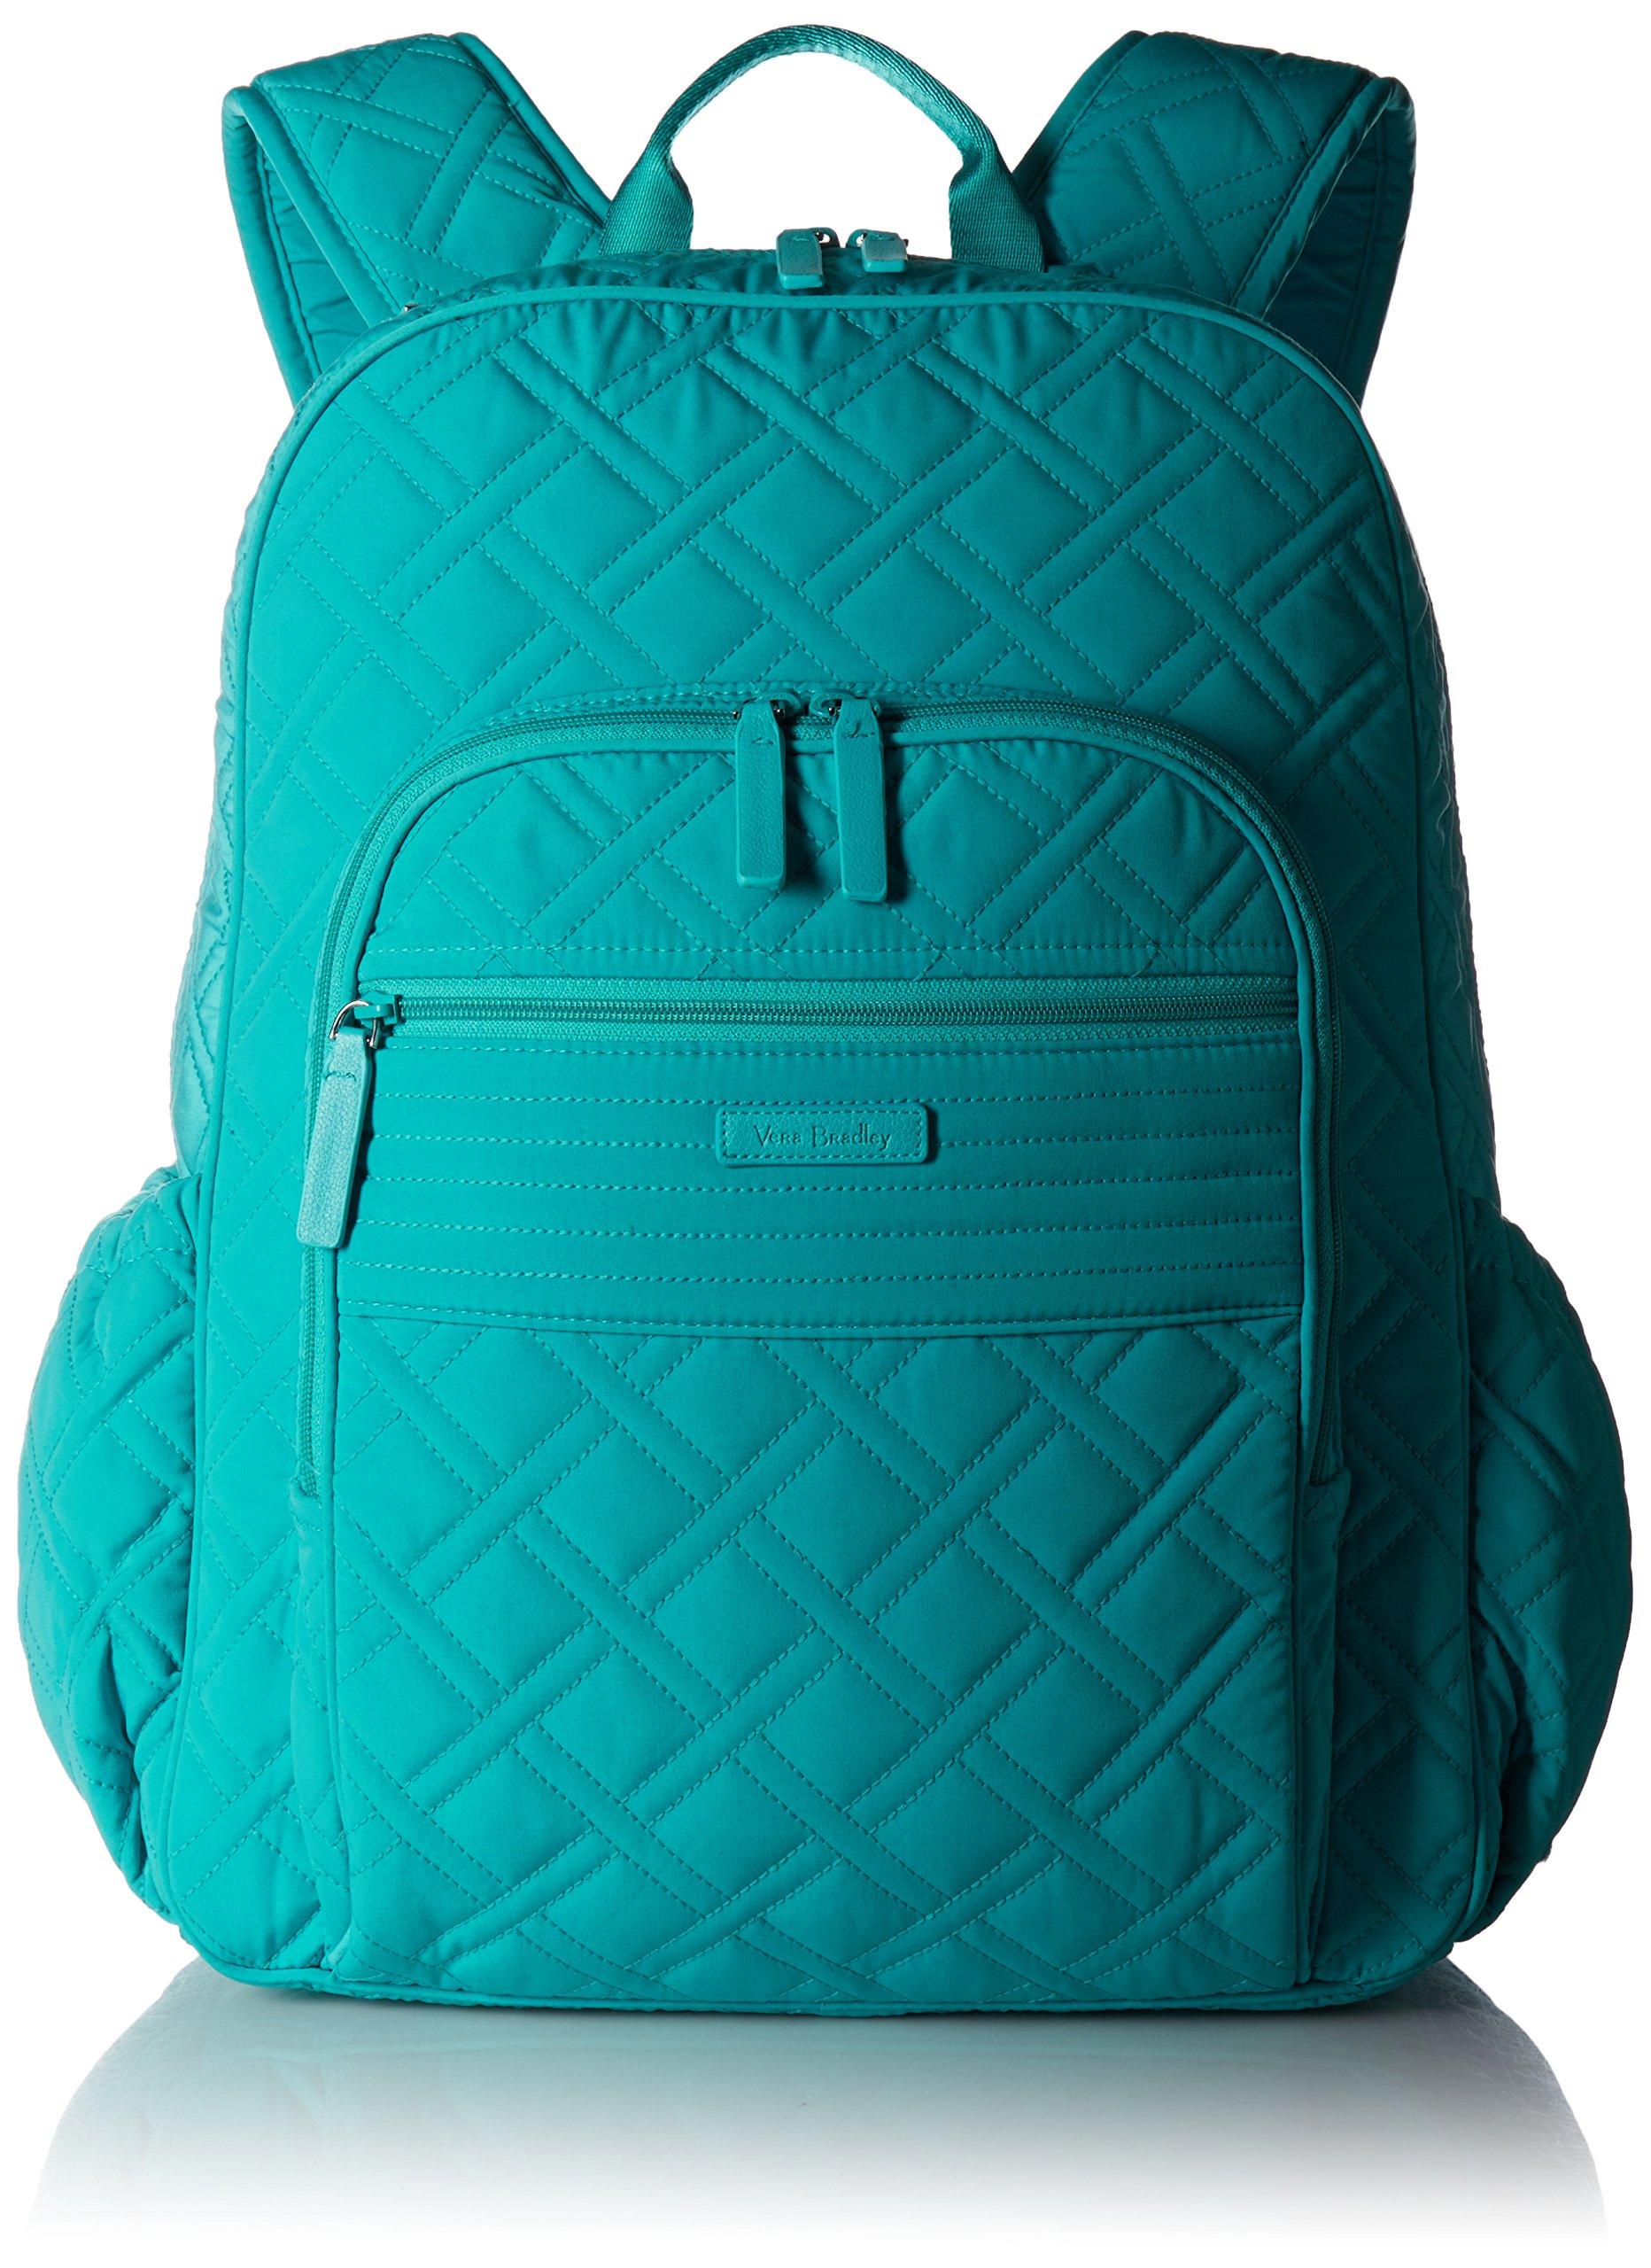 Vera Bradley Women's Backpack, Turquoise Sea by Vera Bradley